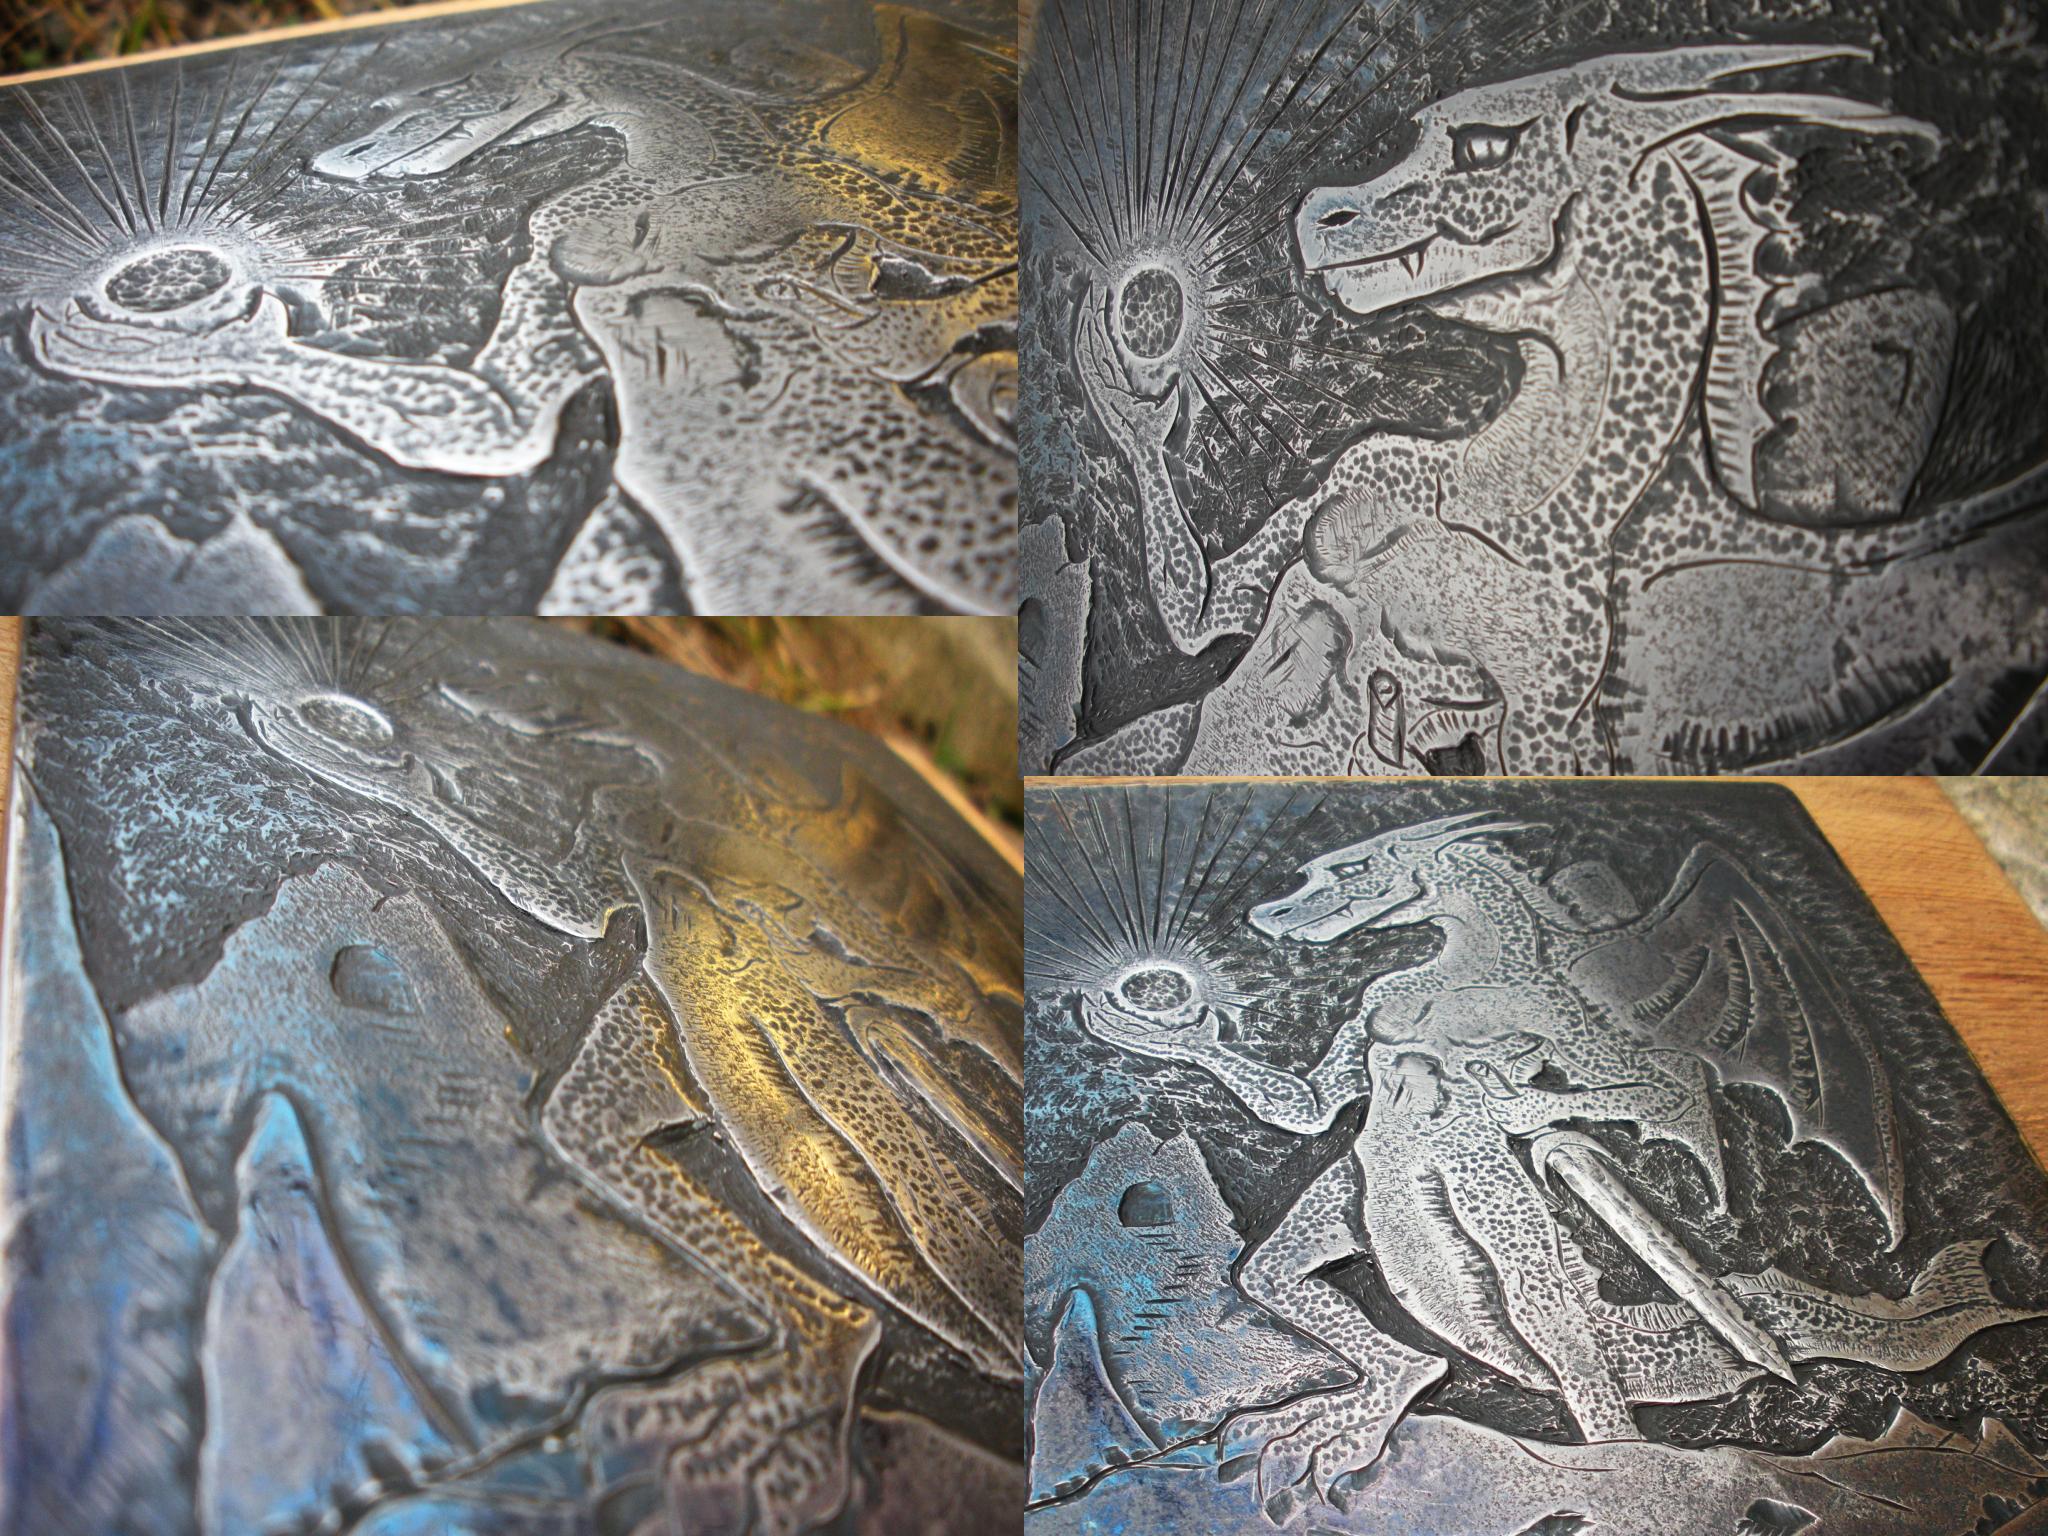 Mountain Dragon Engraving - more angles